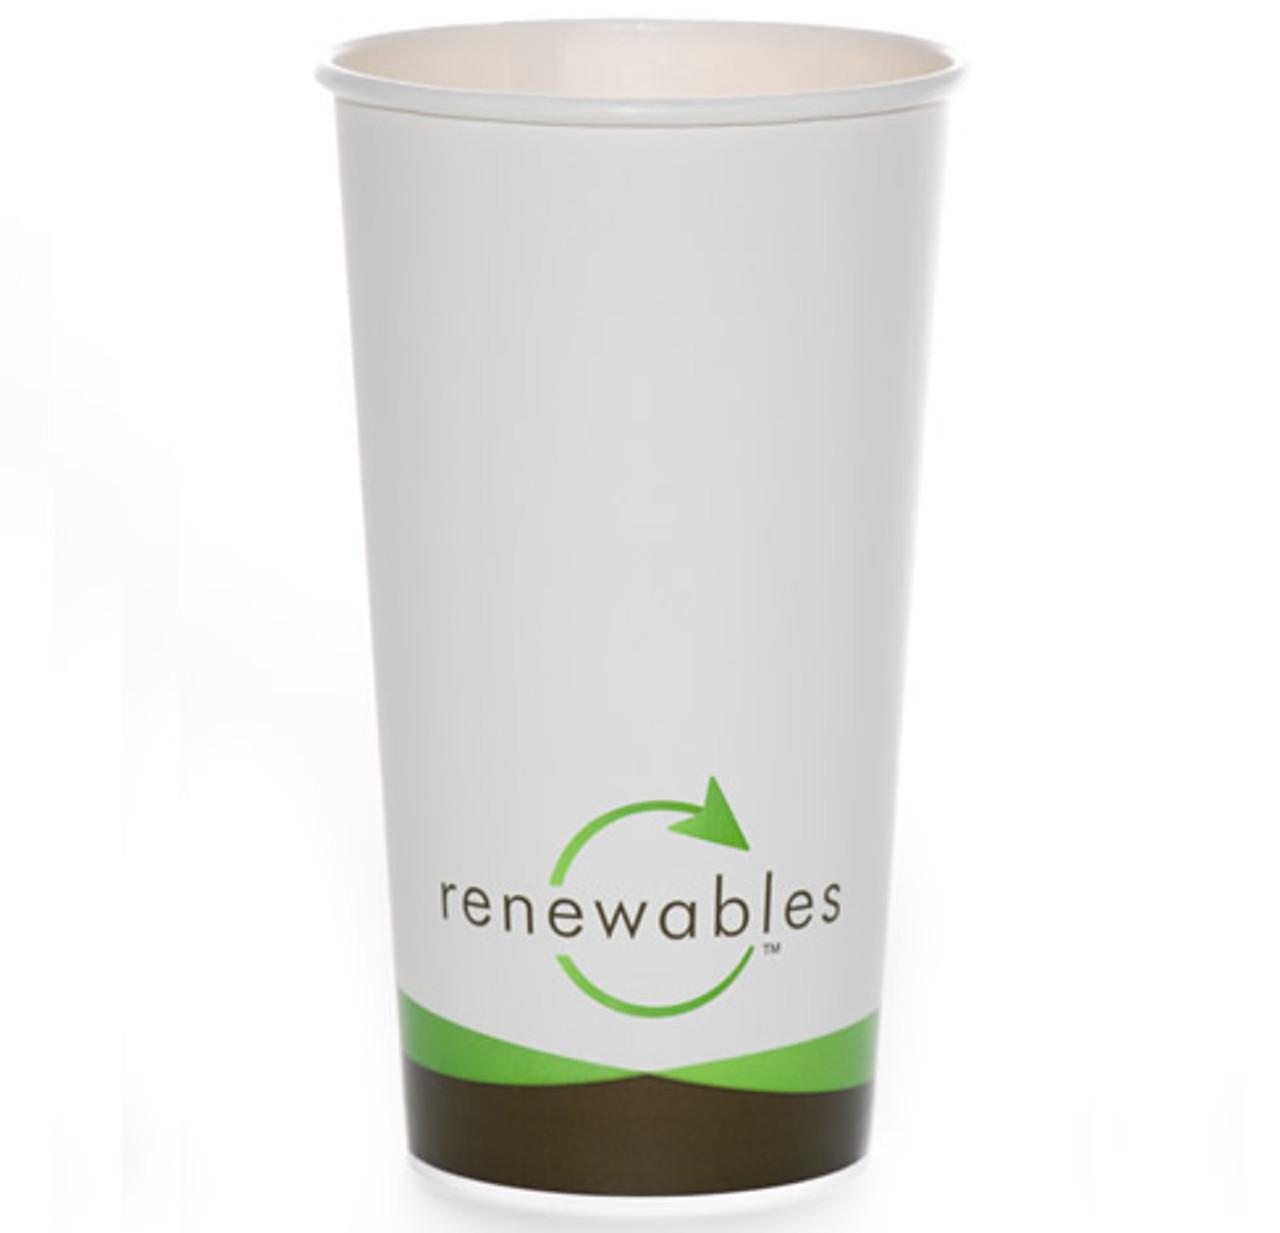 20oz Renewables™ Coffee Cup